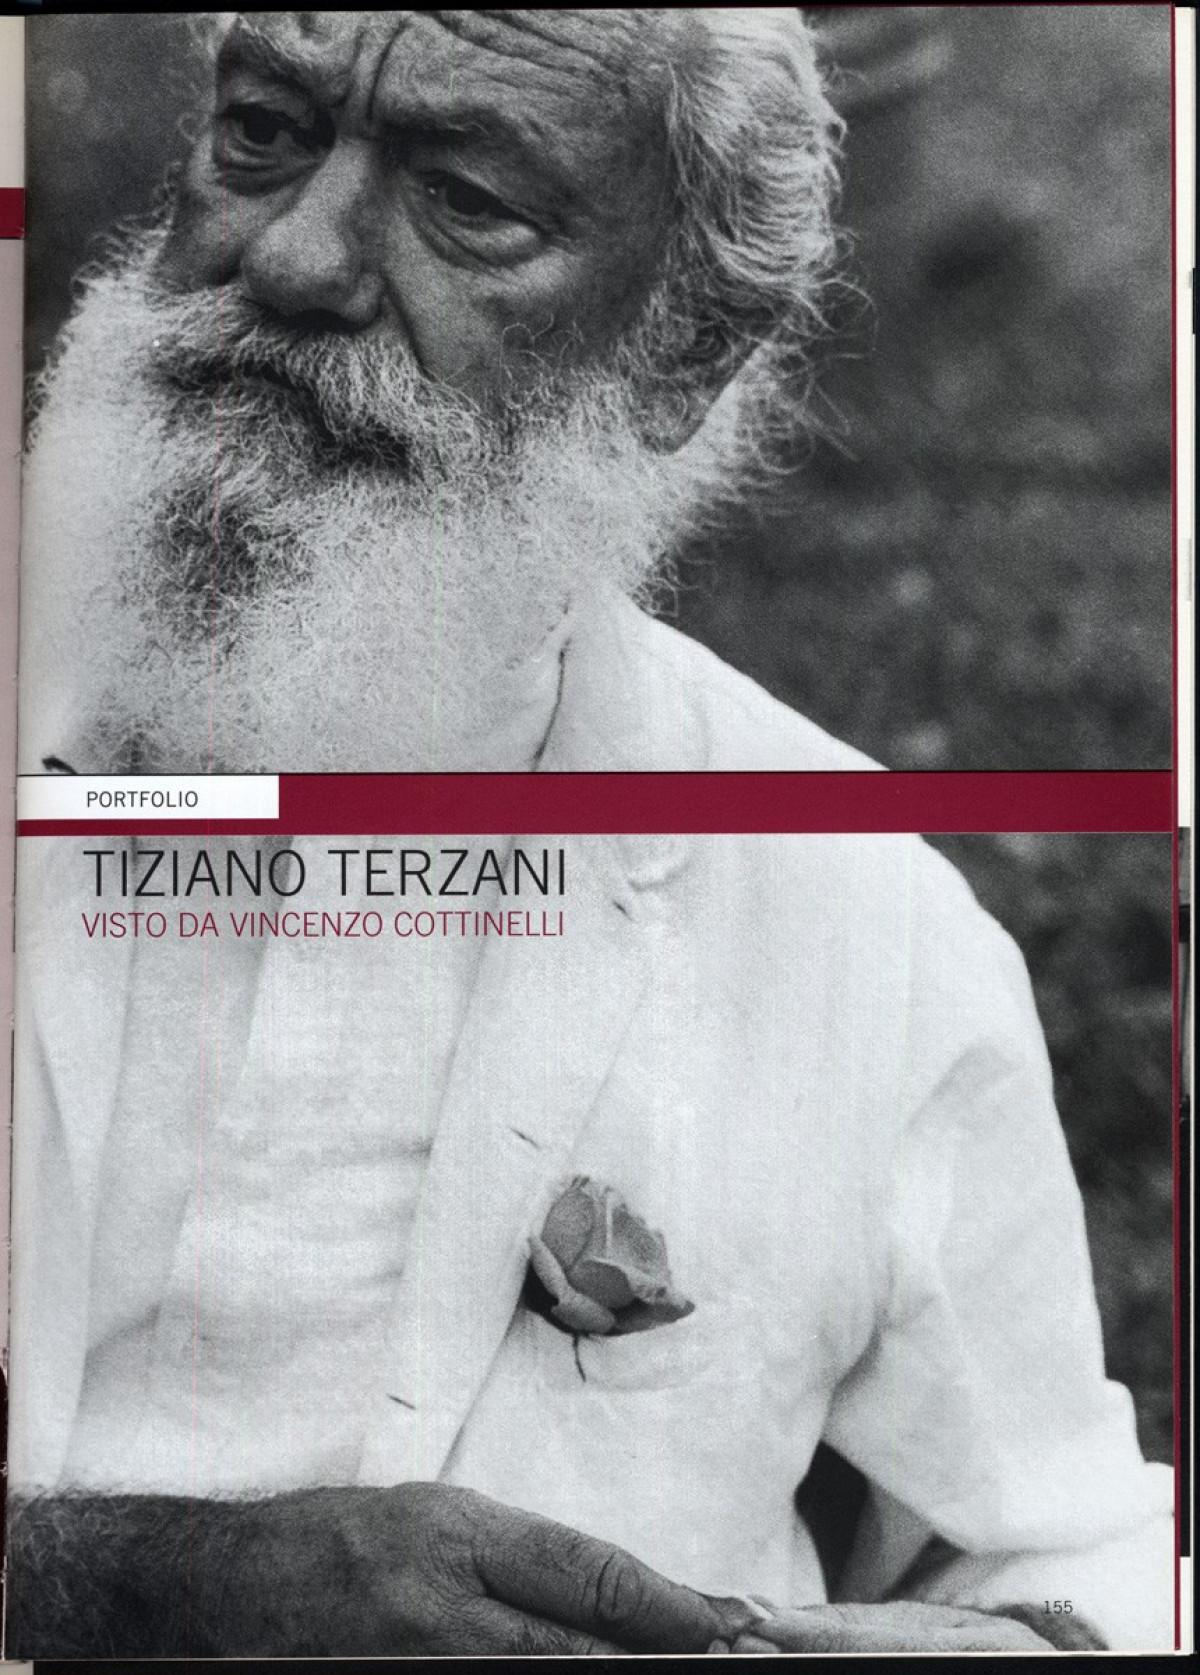 2005 - Tiziano Terzani - East